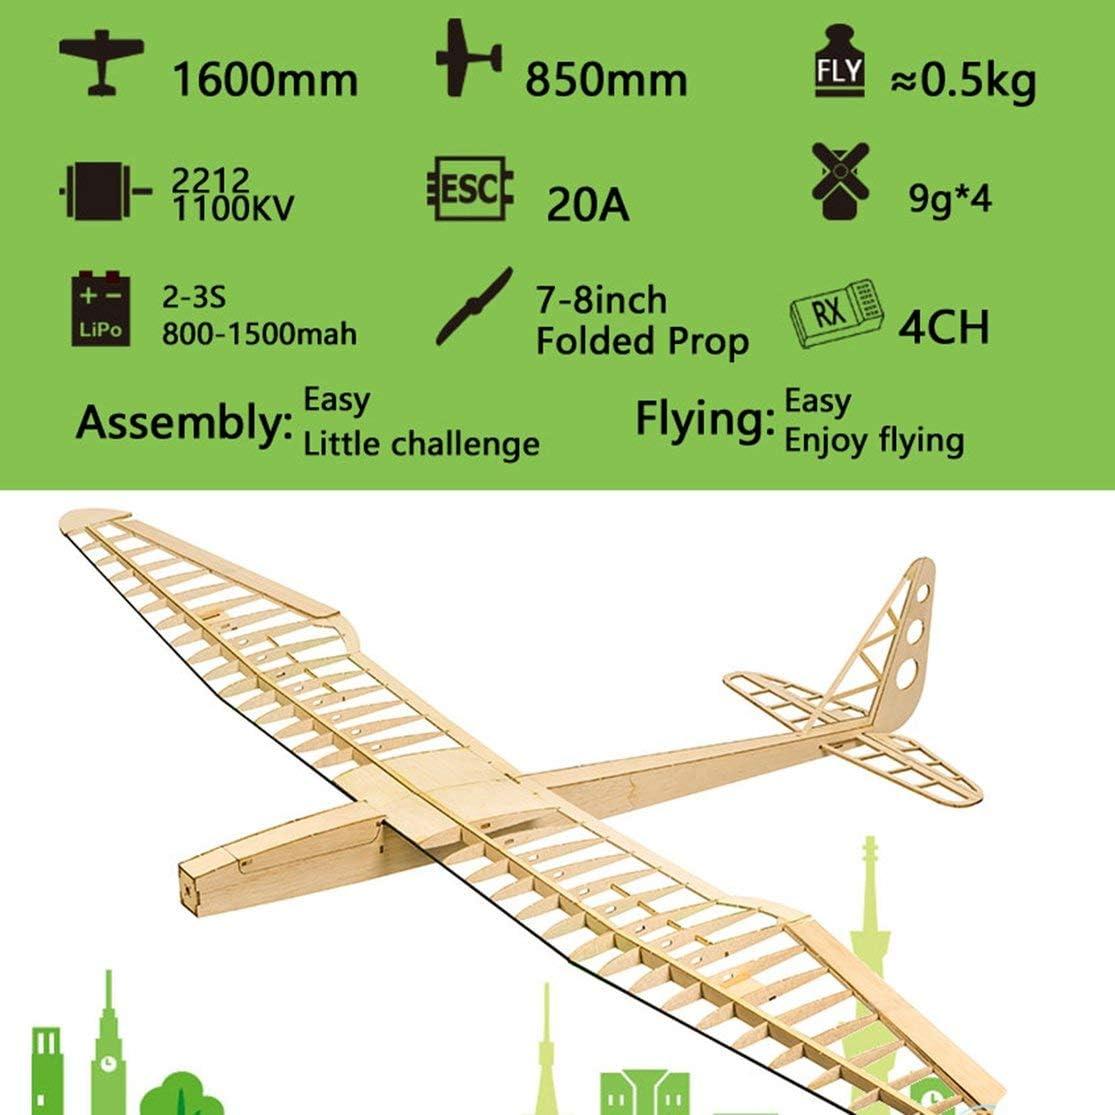 zhouweiwei EP Sunbird Balsa Wood Glider Plane con hélice plegada de 8 Pulgadas 1.6M Wingspan Biplano RC Airplane Model Aircraft Kit/PNP